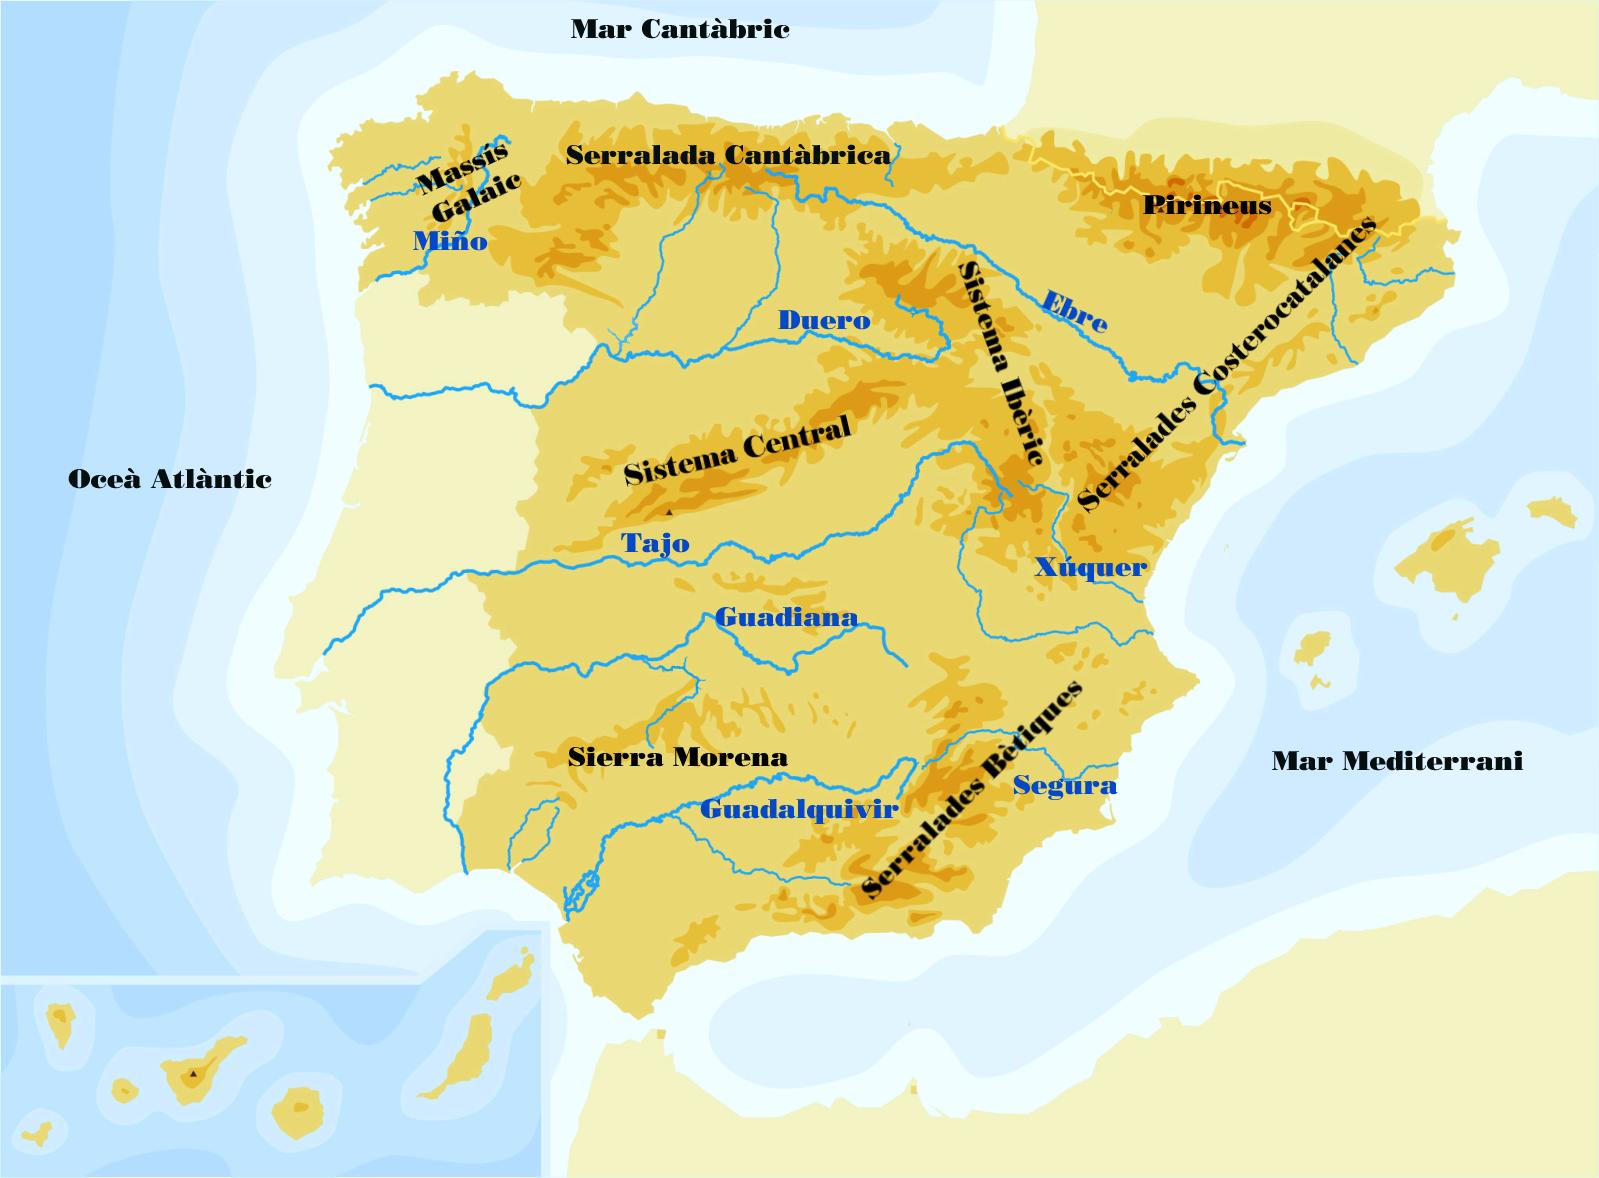 Mapa Fisic D Europa Rius.Mapa Rius Europa